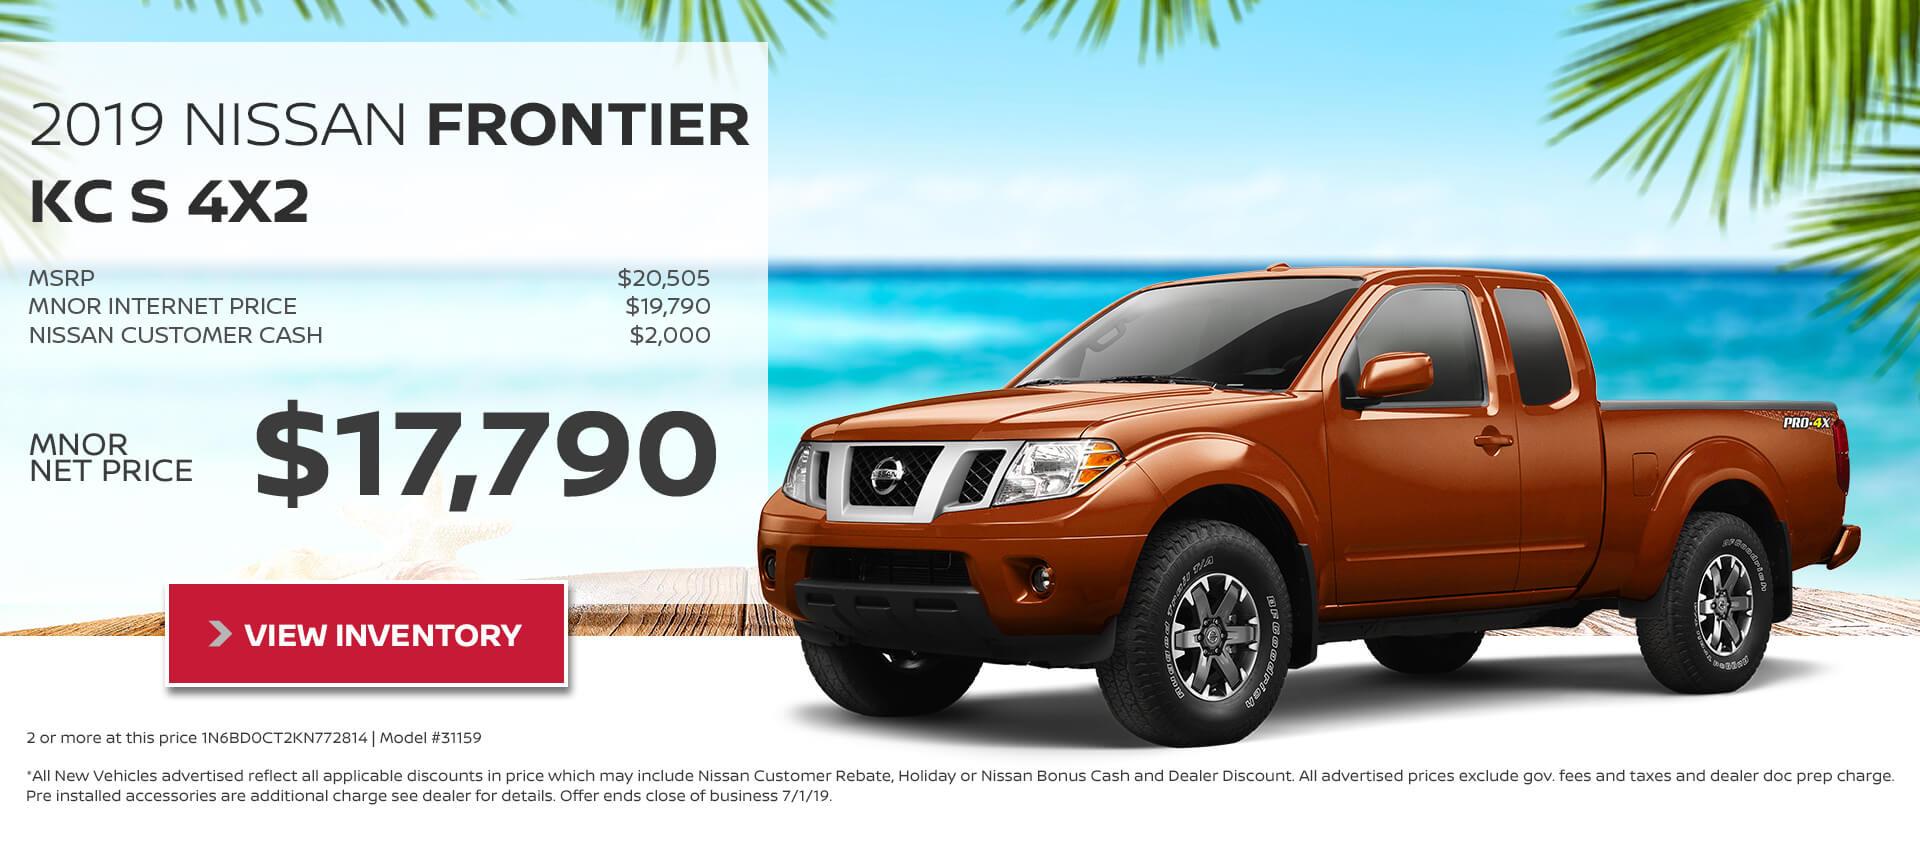 Nissan Frontier KC $17790